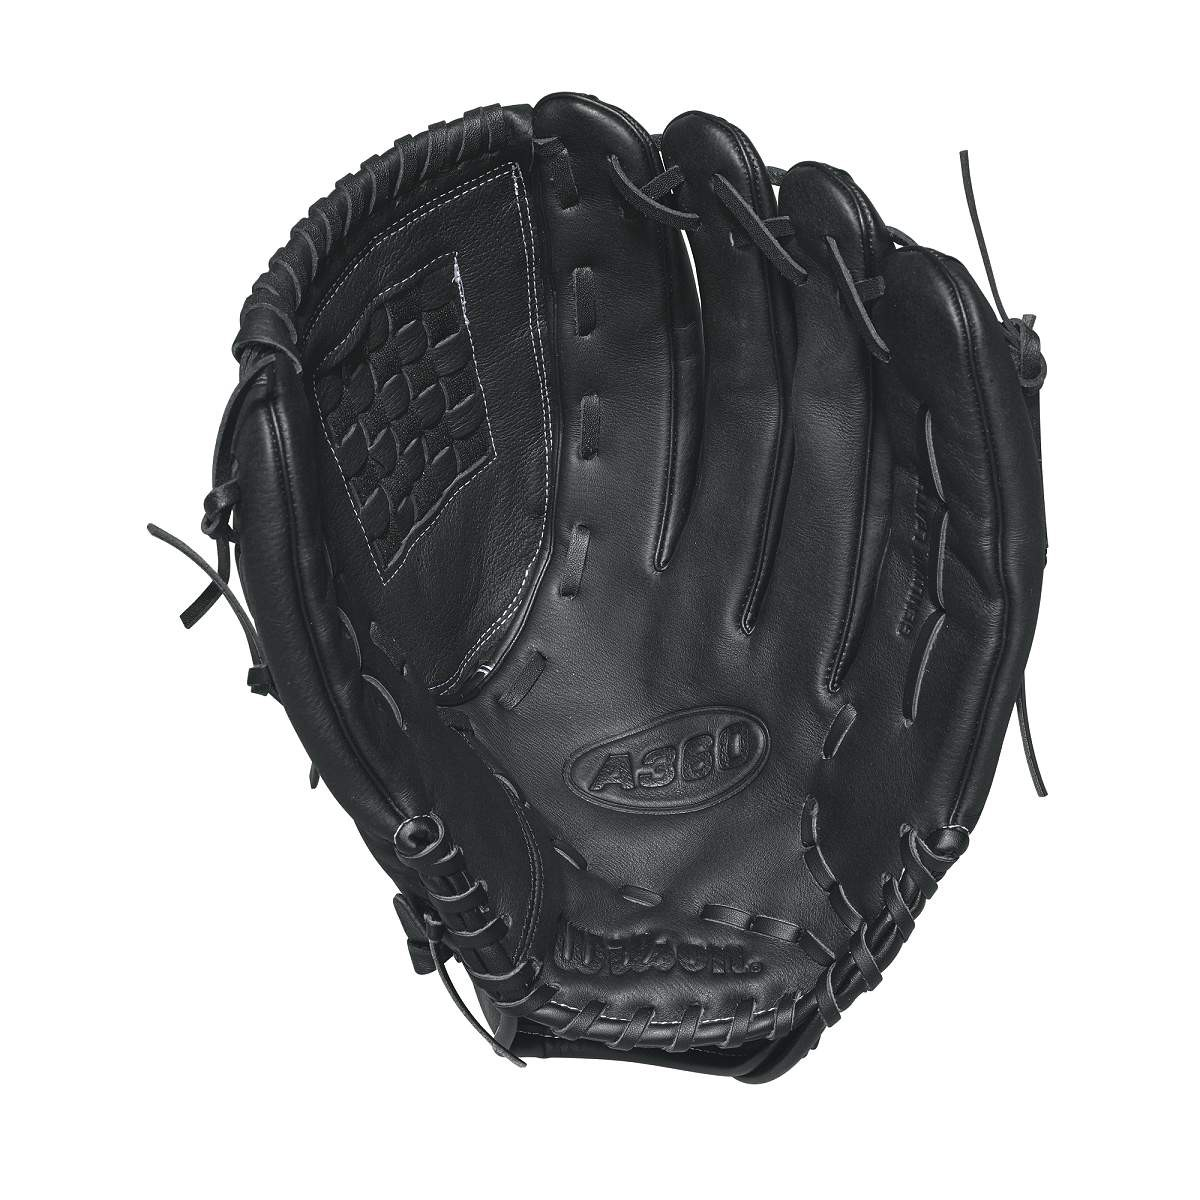 "Wilson A360 Slowpitch Glove 14"" Right Hand Thrower"